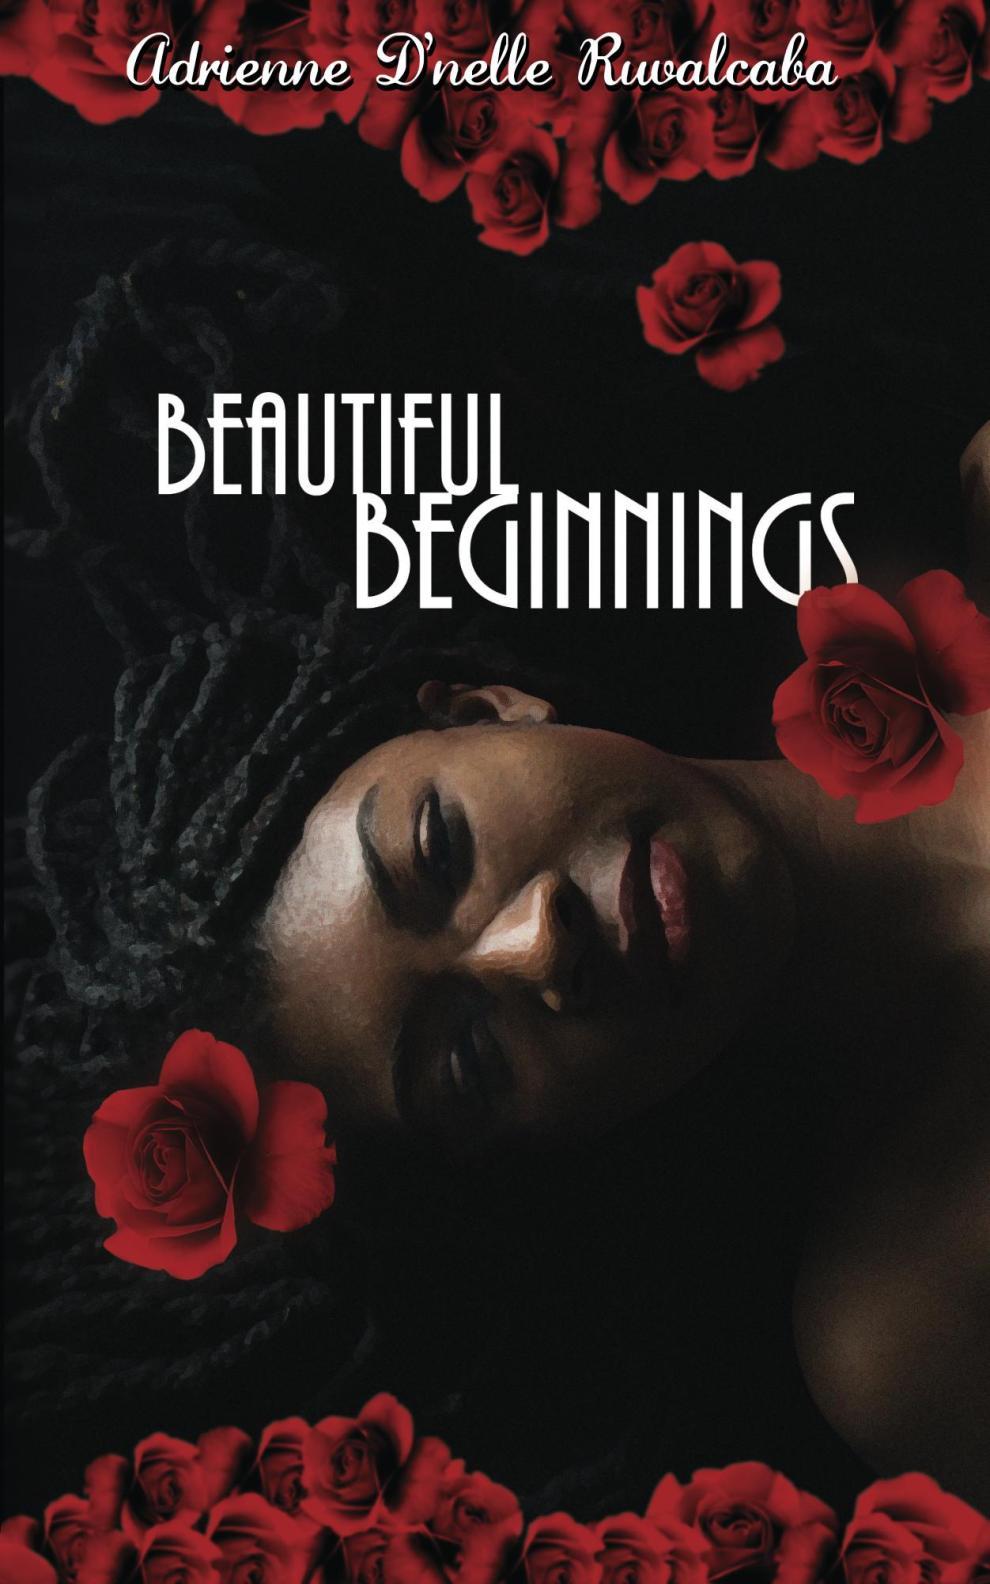 Beautiful_Beginnings_Cover_for_Kindle[9684].jpg